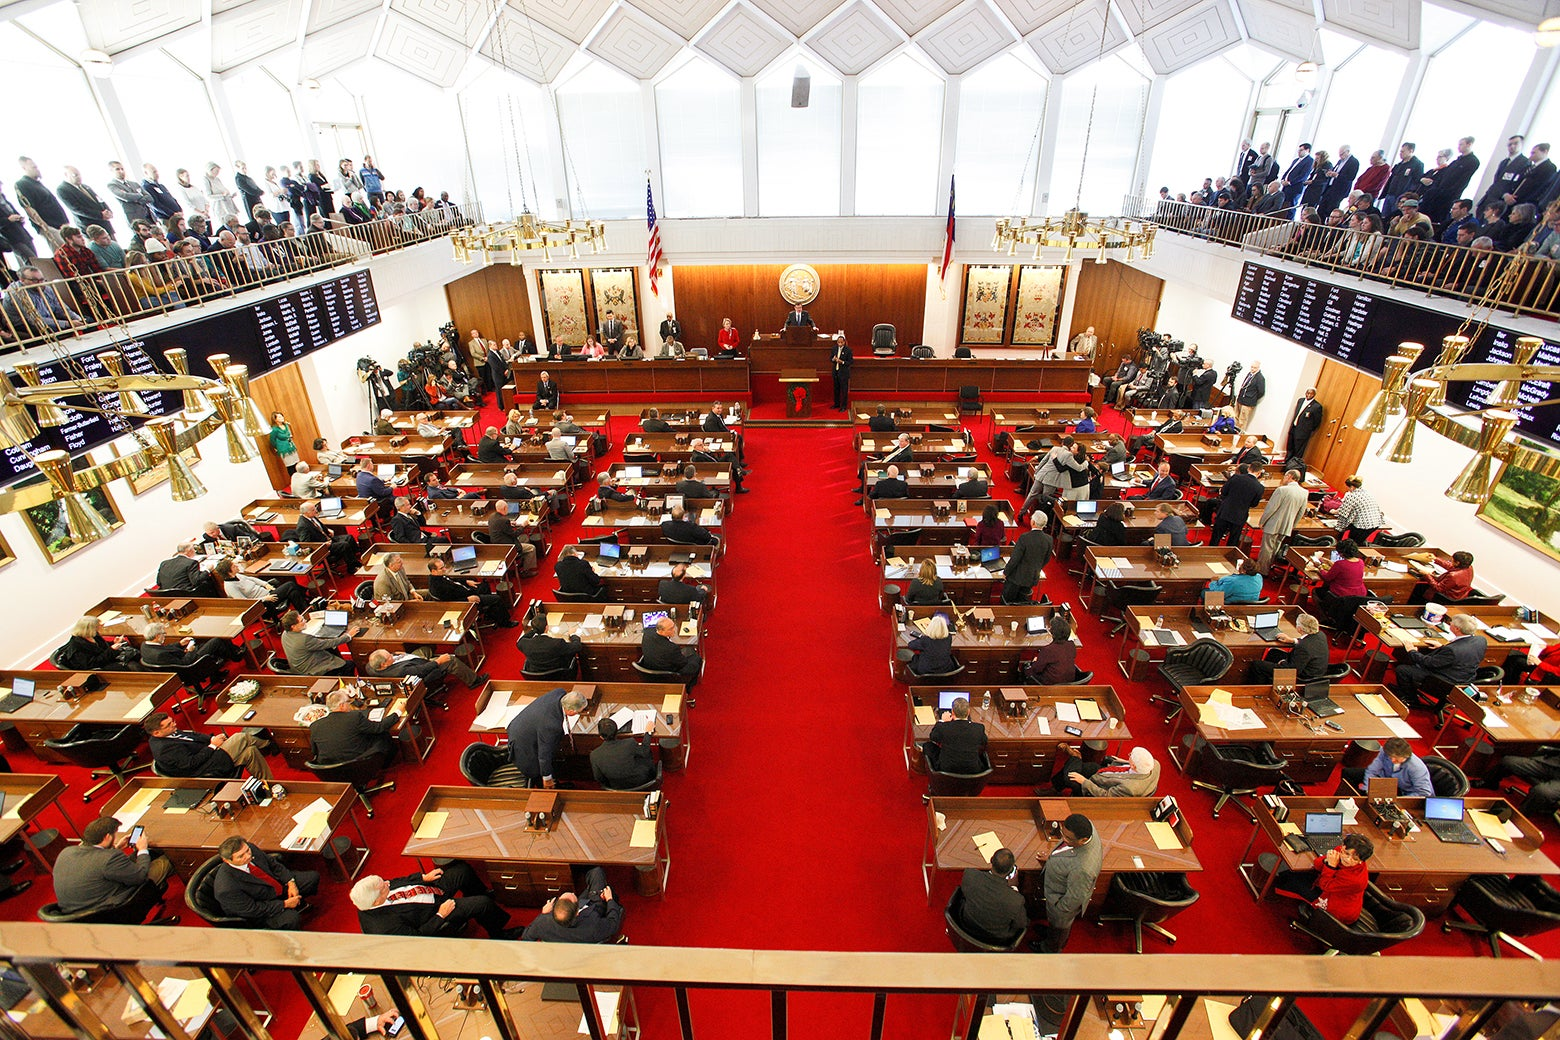 North Carolina's House of Representatives convenes in Raleigh, North Carolina, on Dec. 21, 2016.